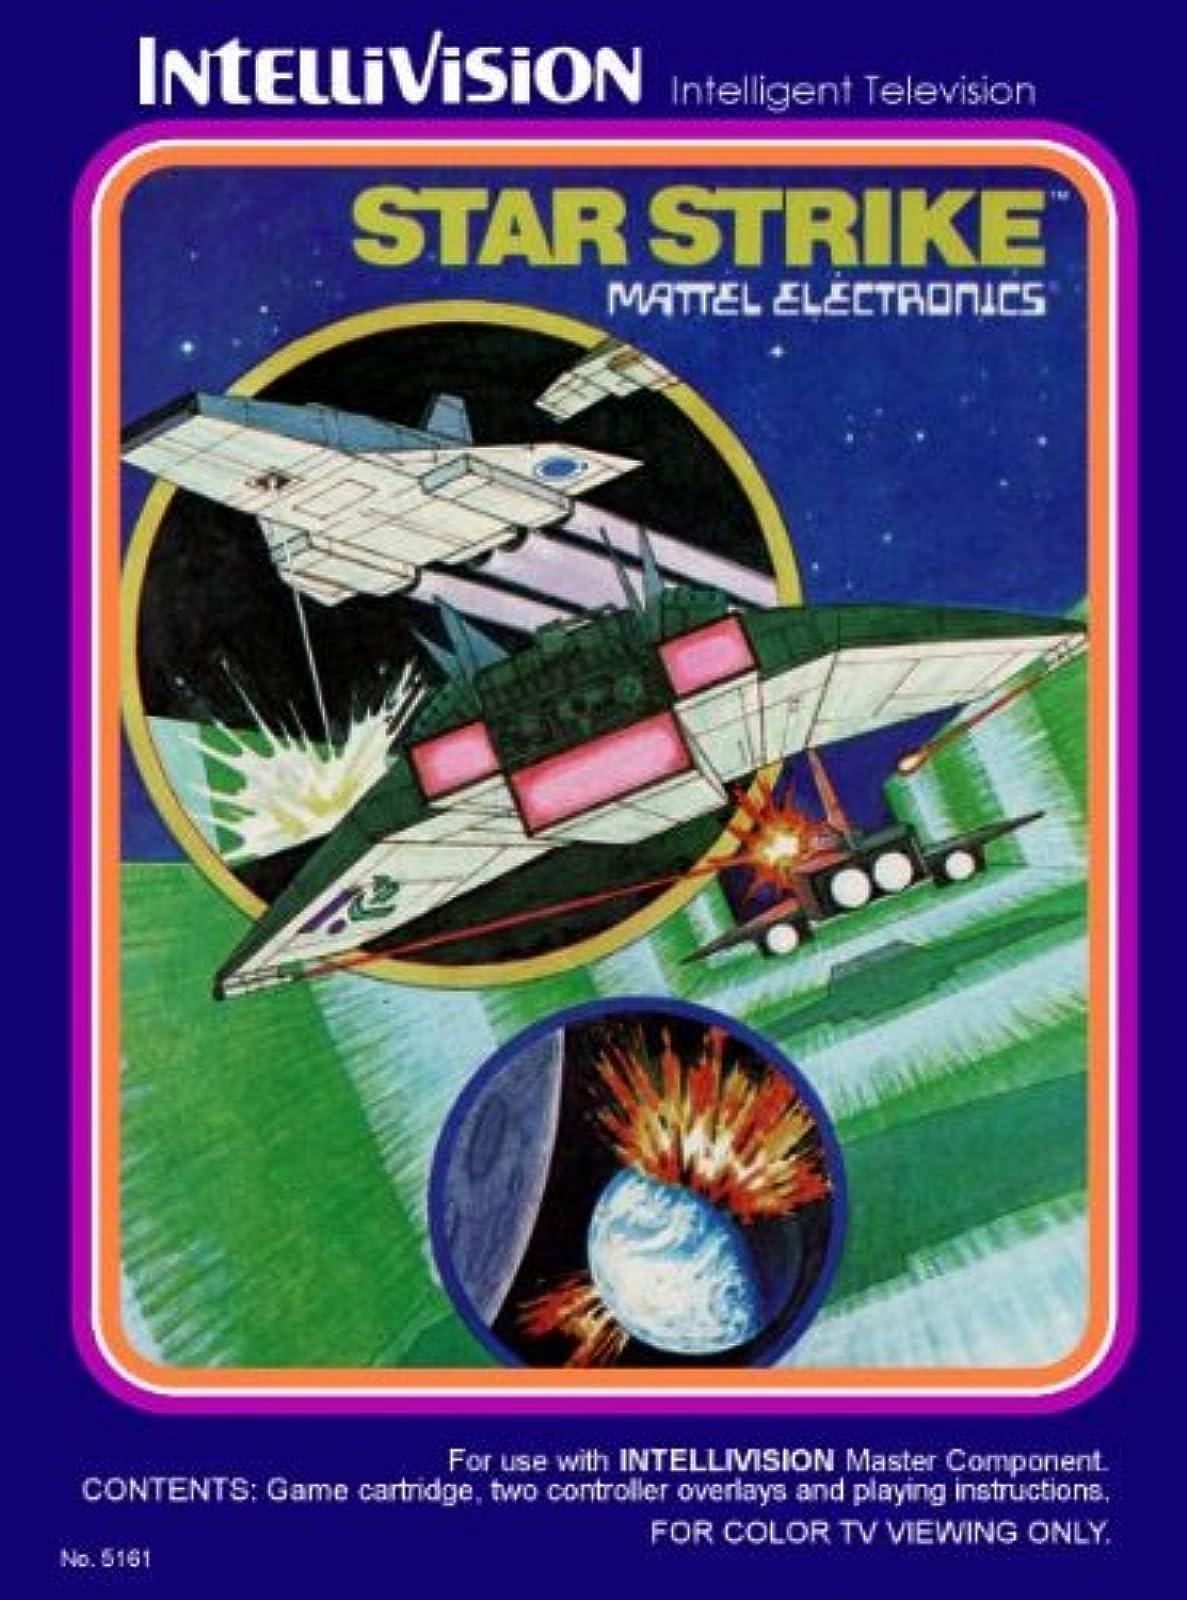 Star Strike Intellivision